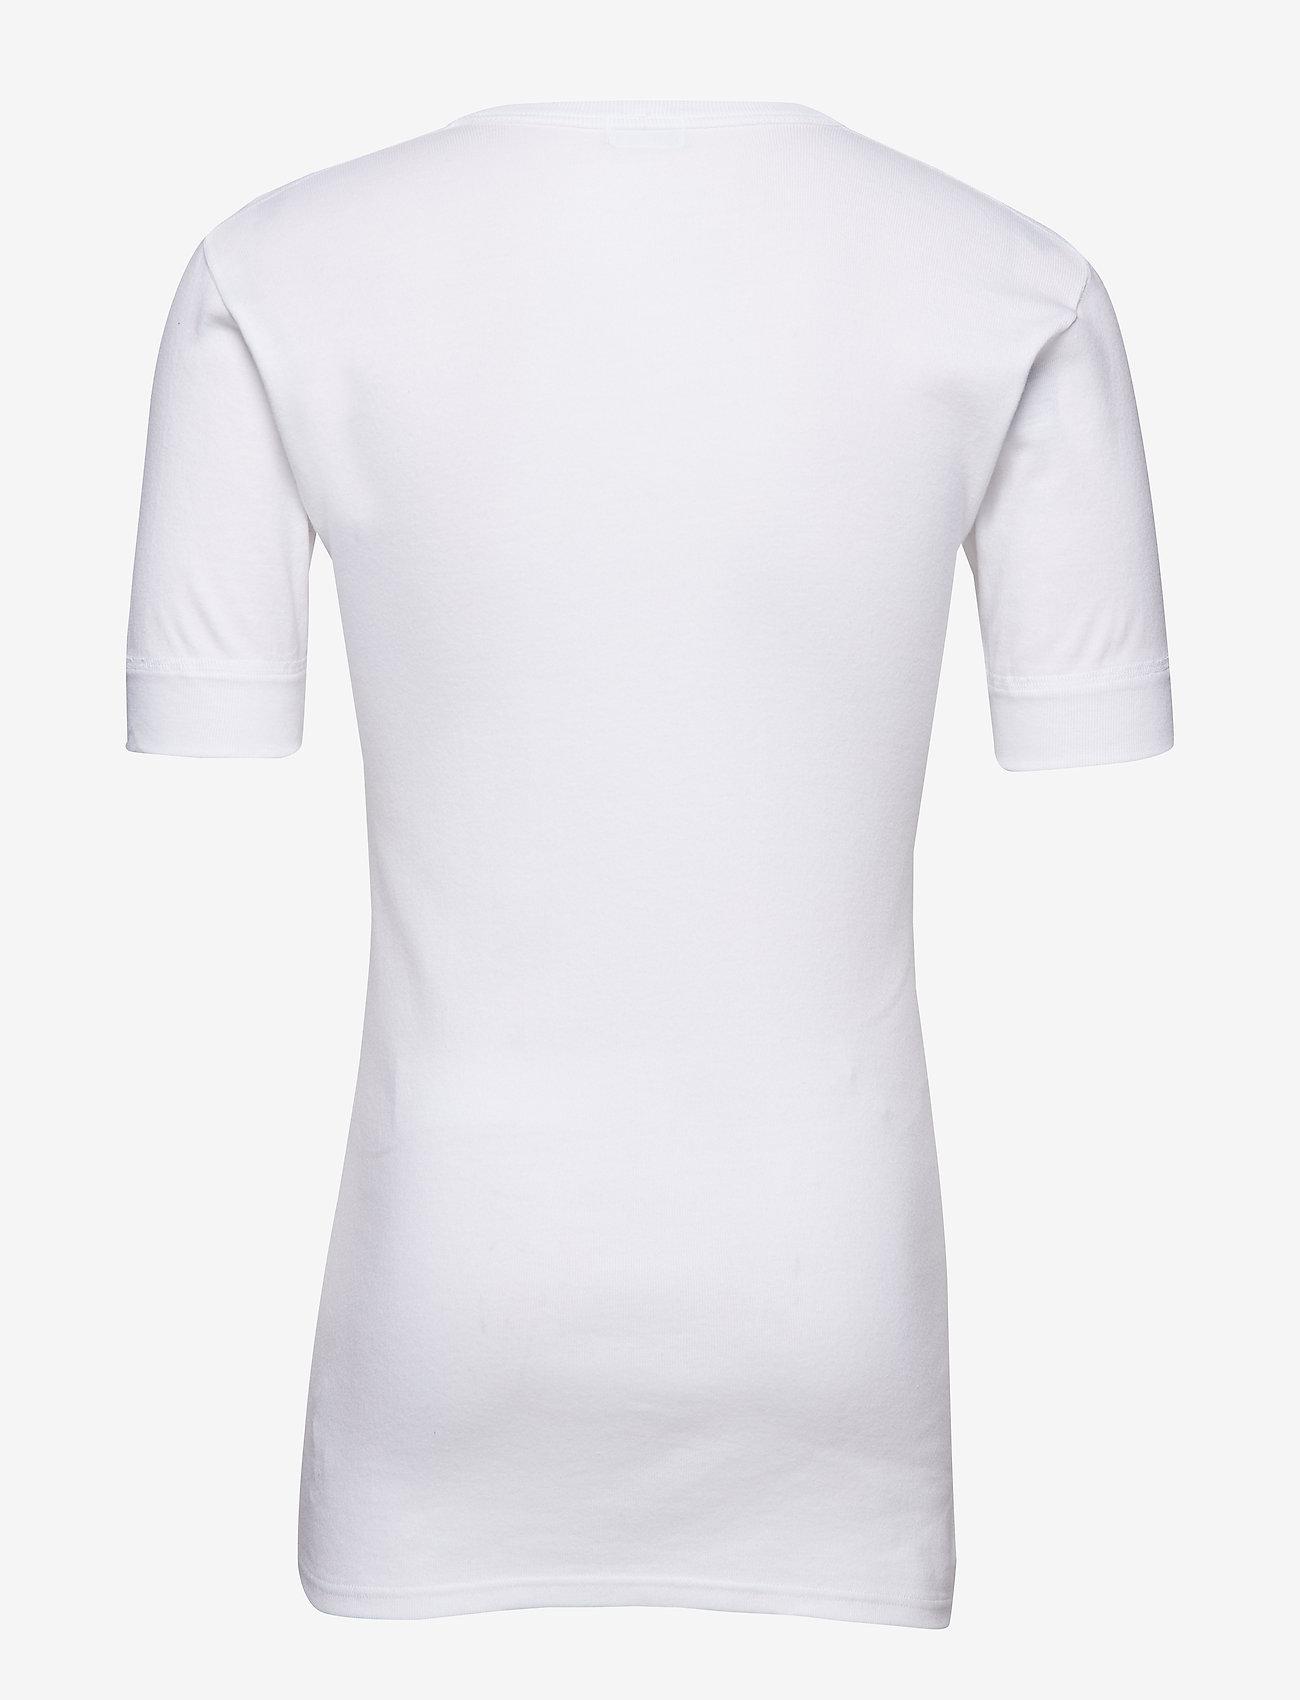 JBS - Original tee - basic t-shirts - white - 1